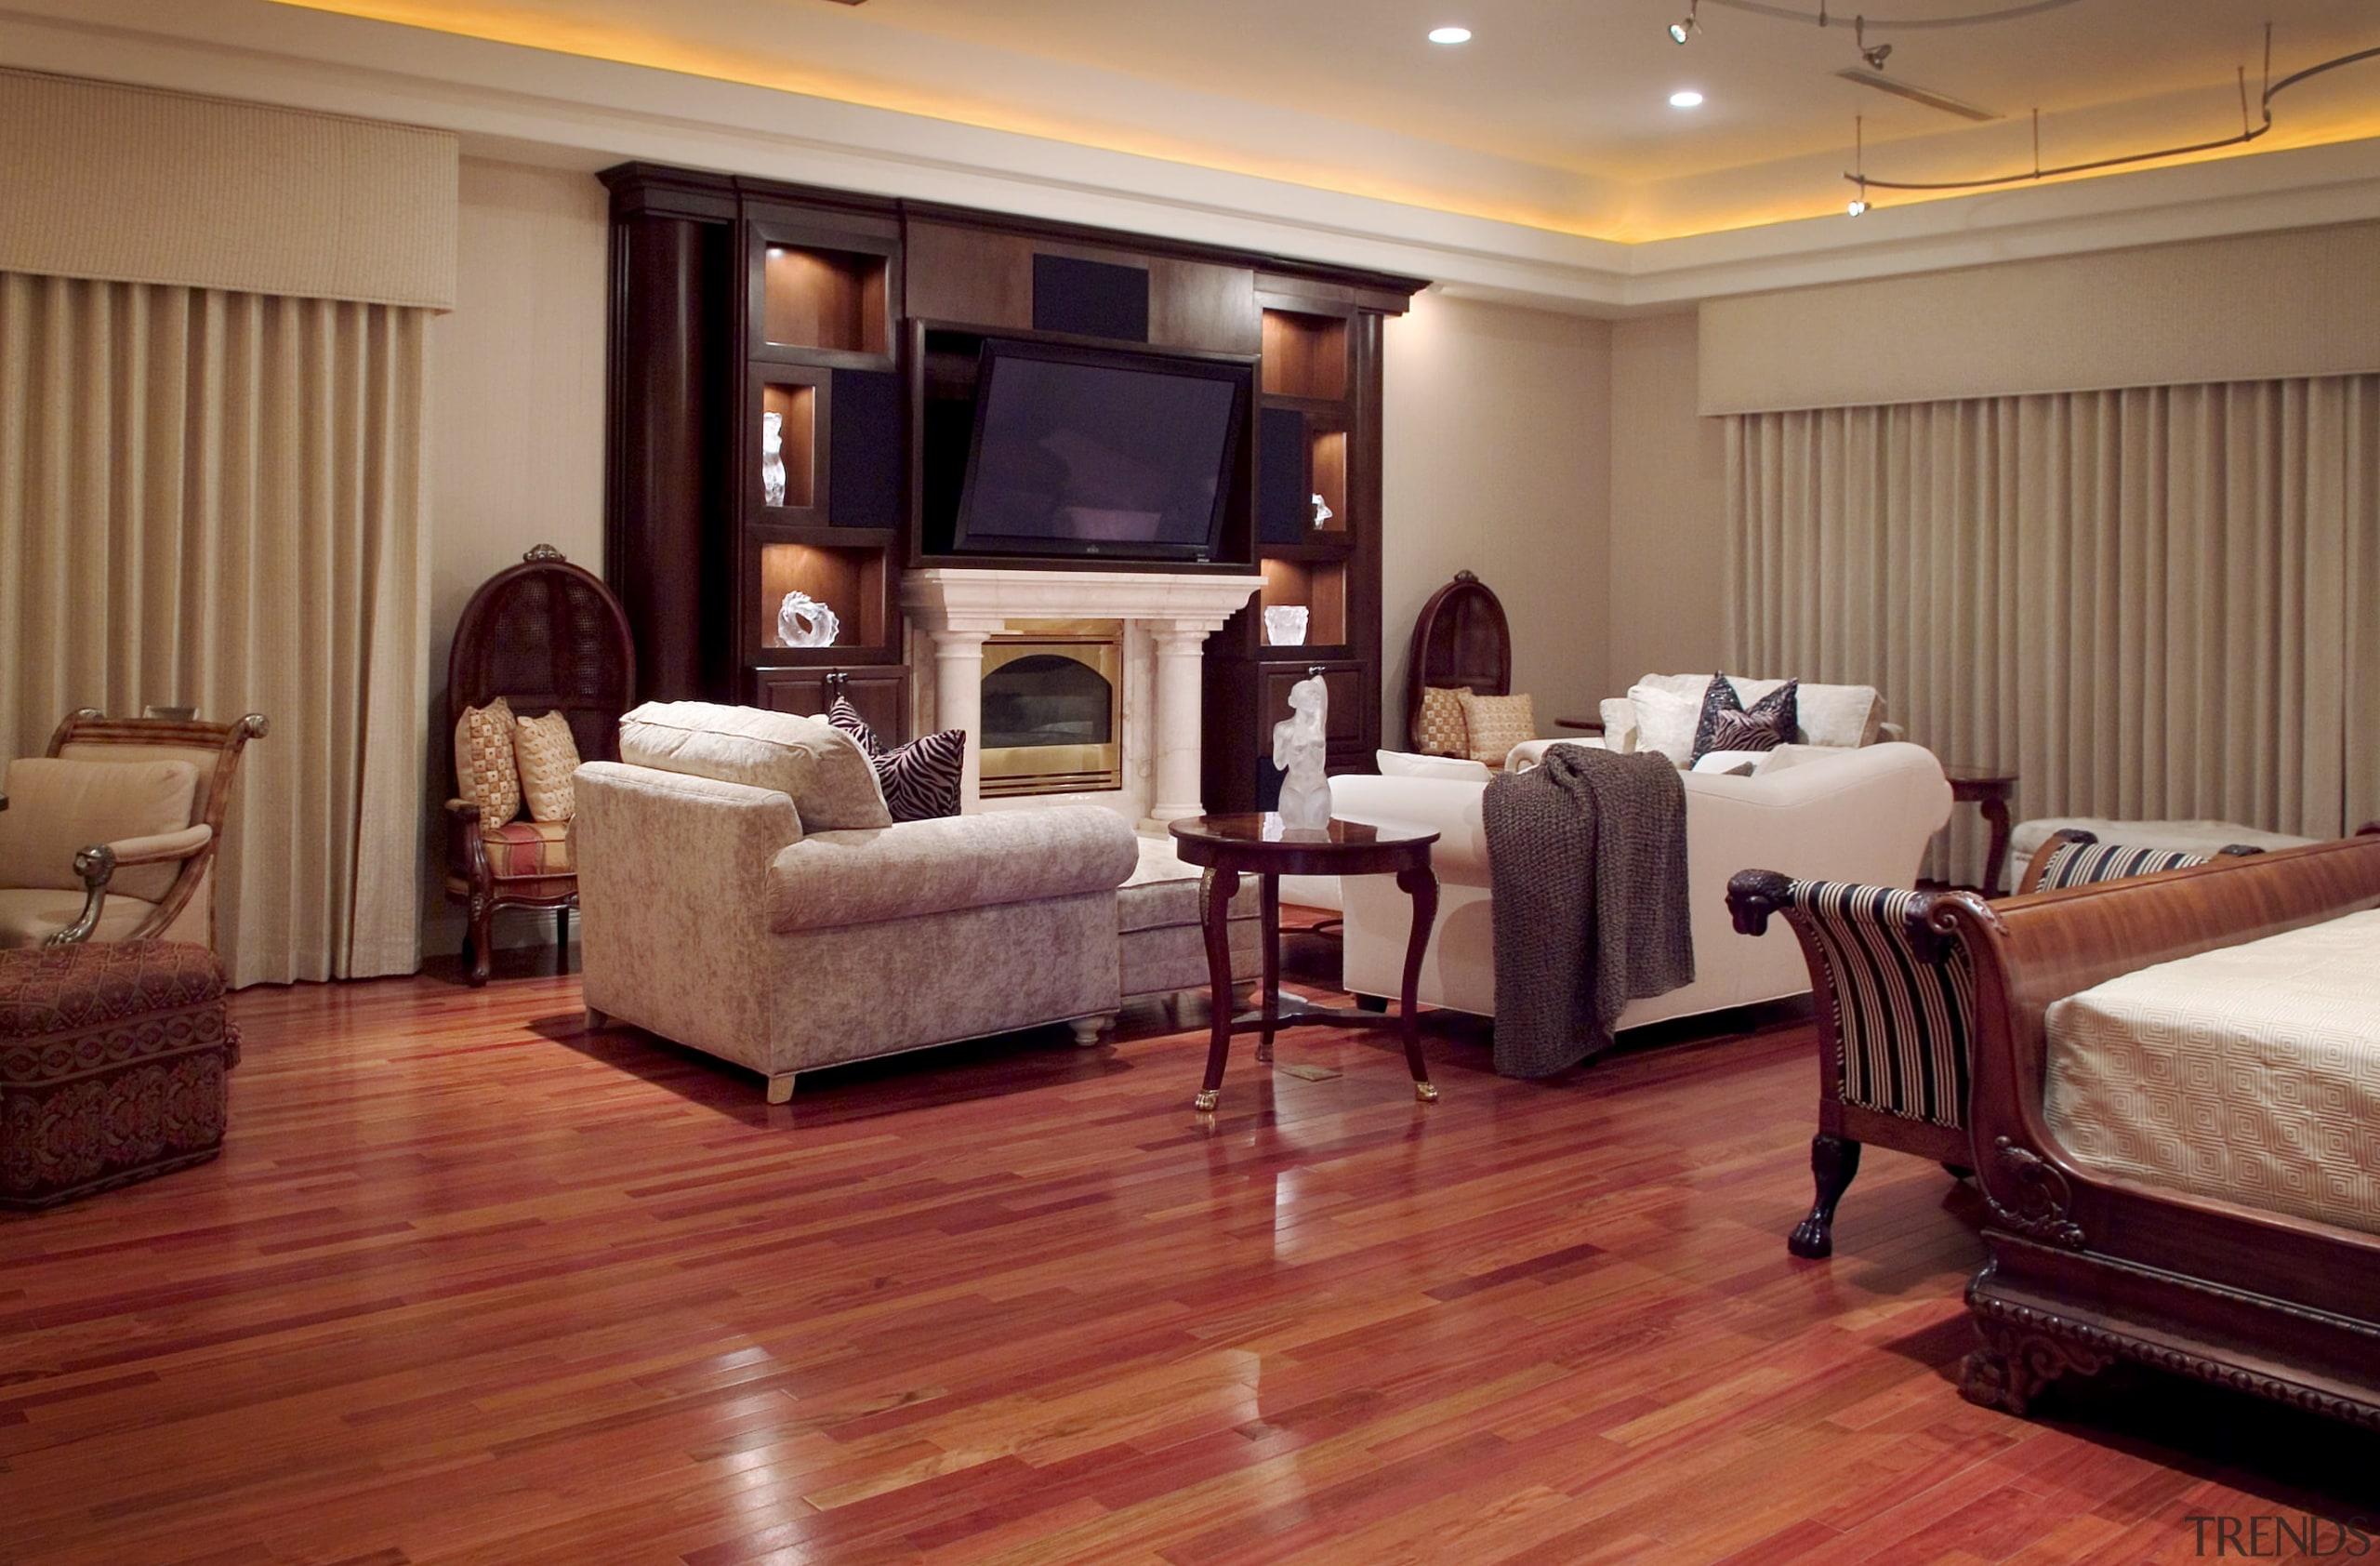 Master bedroom interior view - Master bedroom interior ceiling, floor, flooring, furniture, hardwood, interior design, laminate flooring, living room, room, suite, wood, wood flooring, brown, red